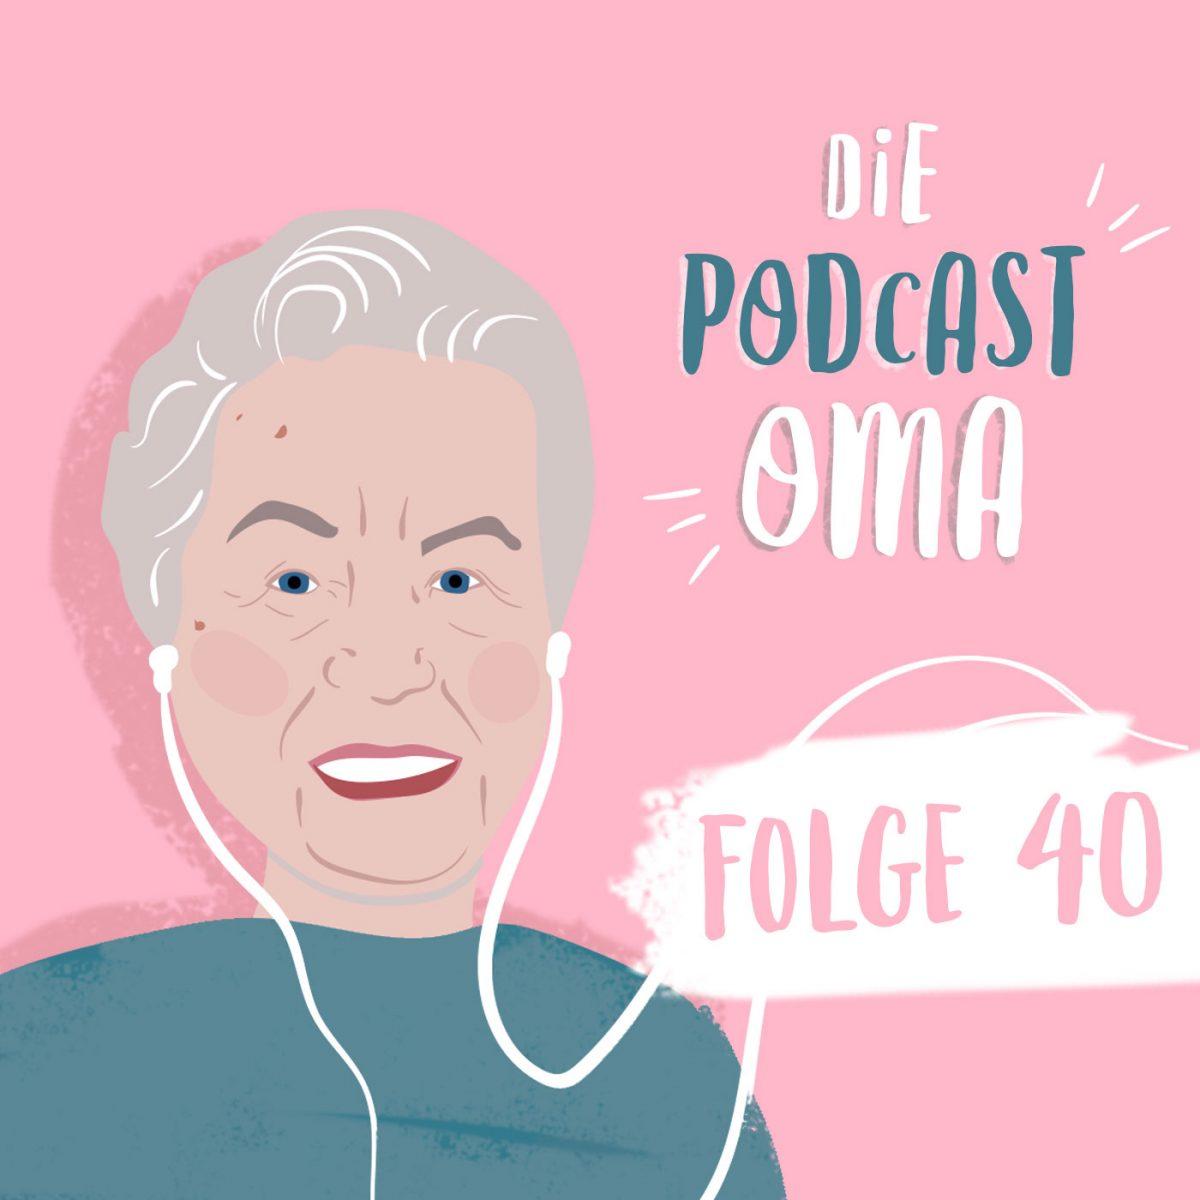 Dating-podcasts für männer über 40